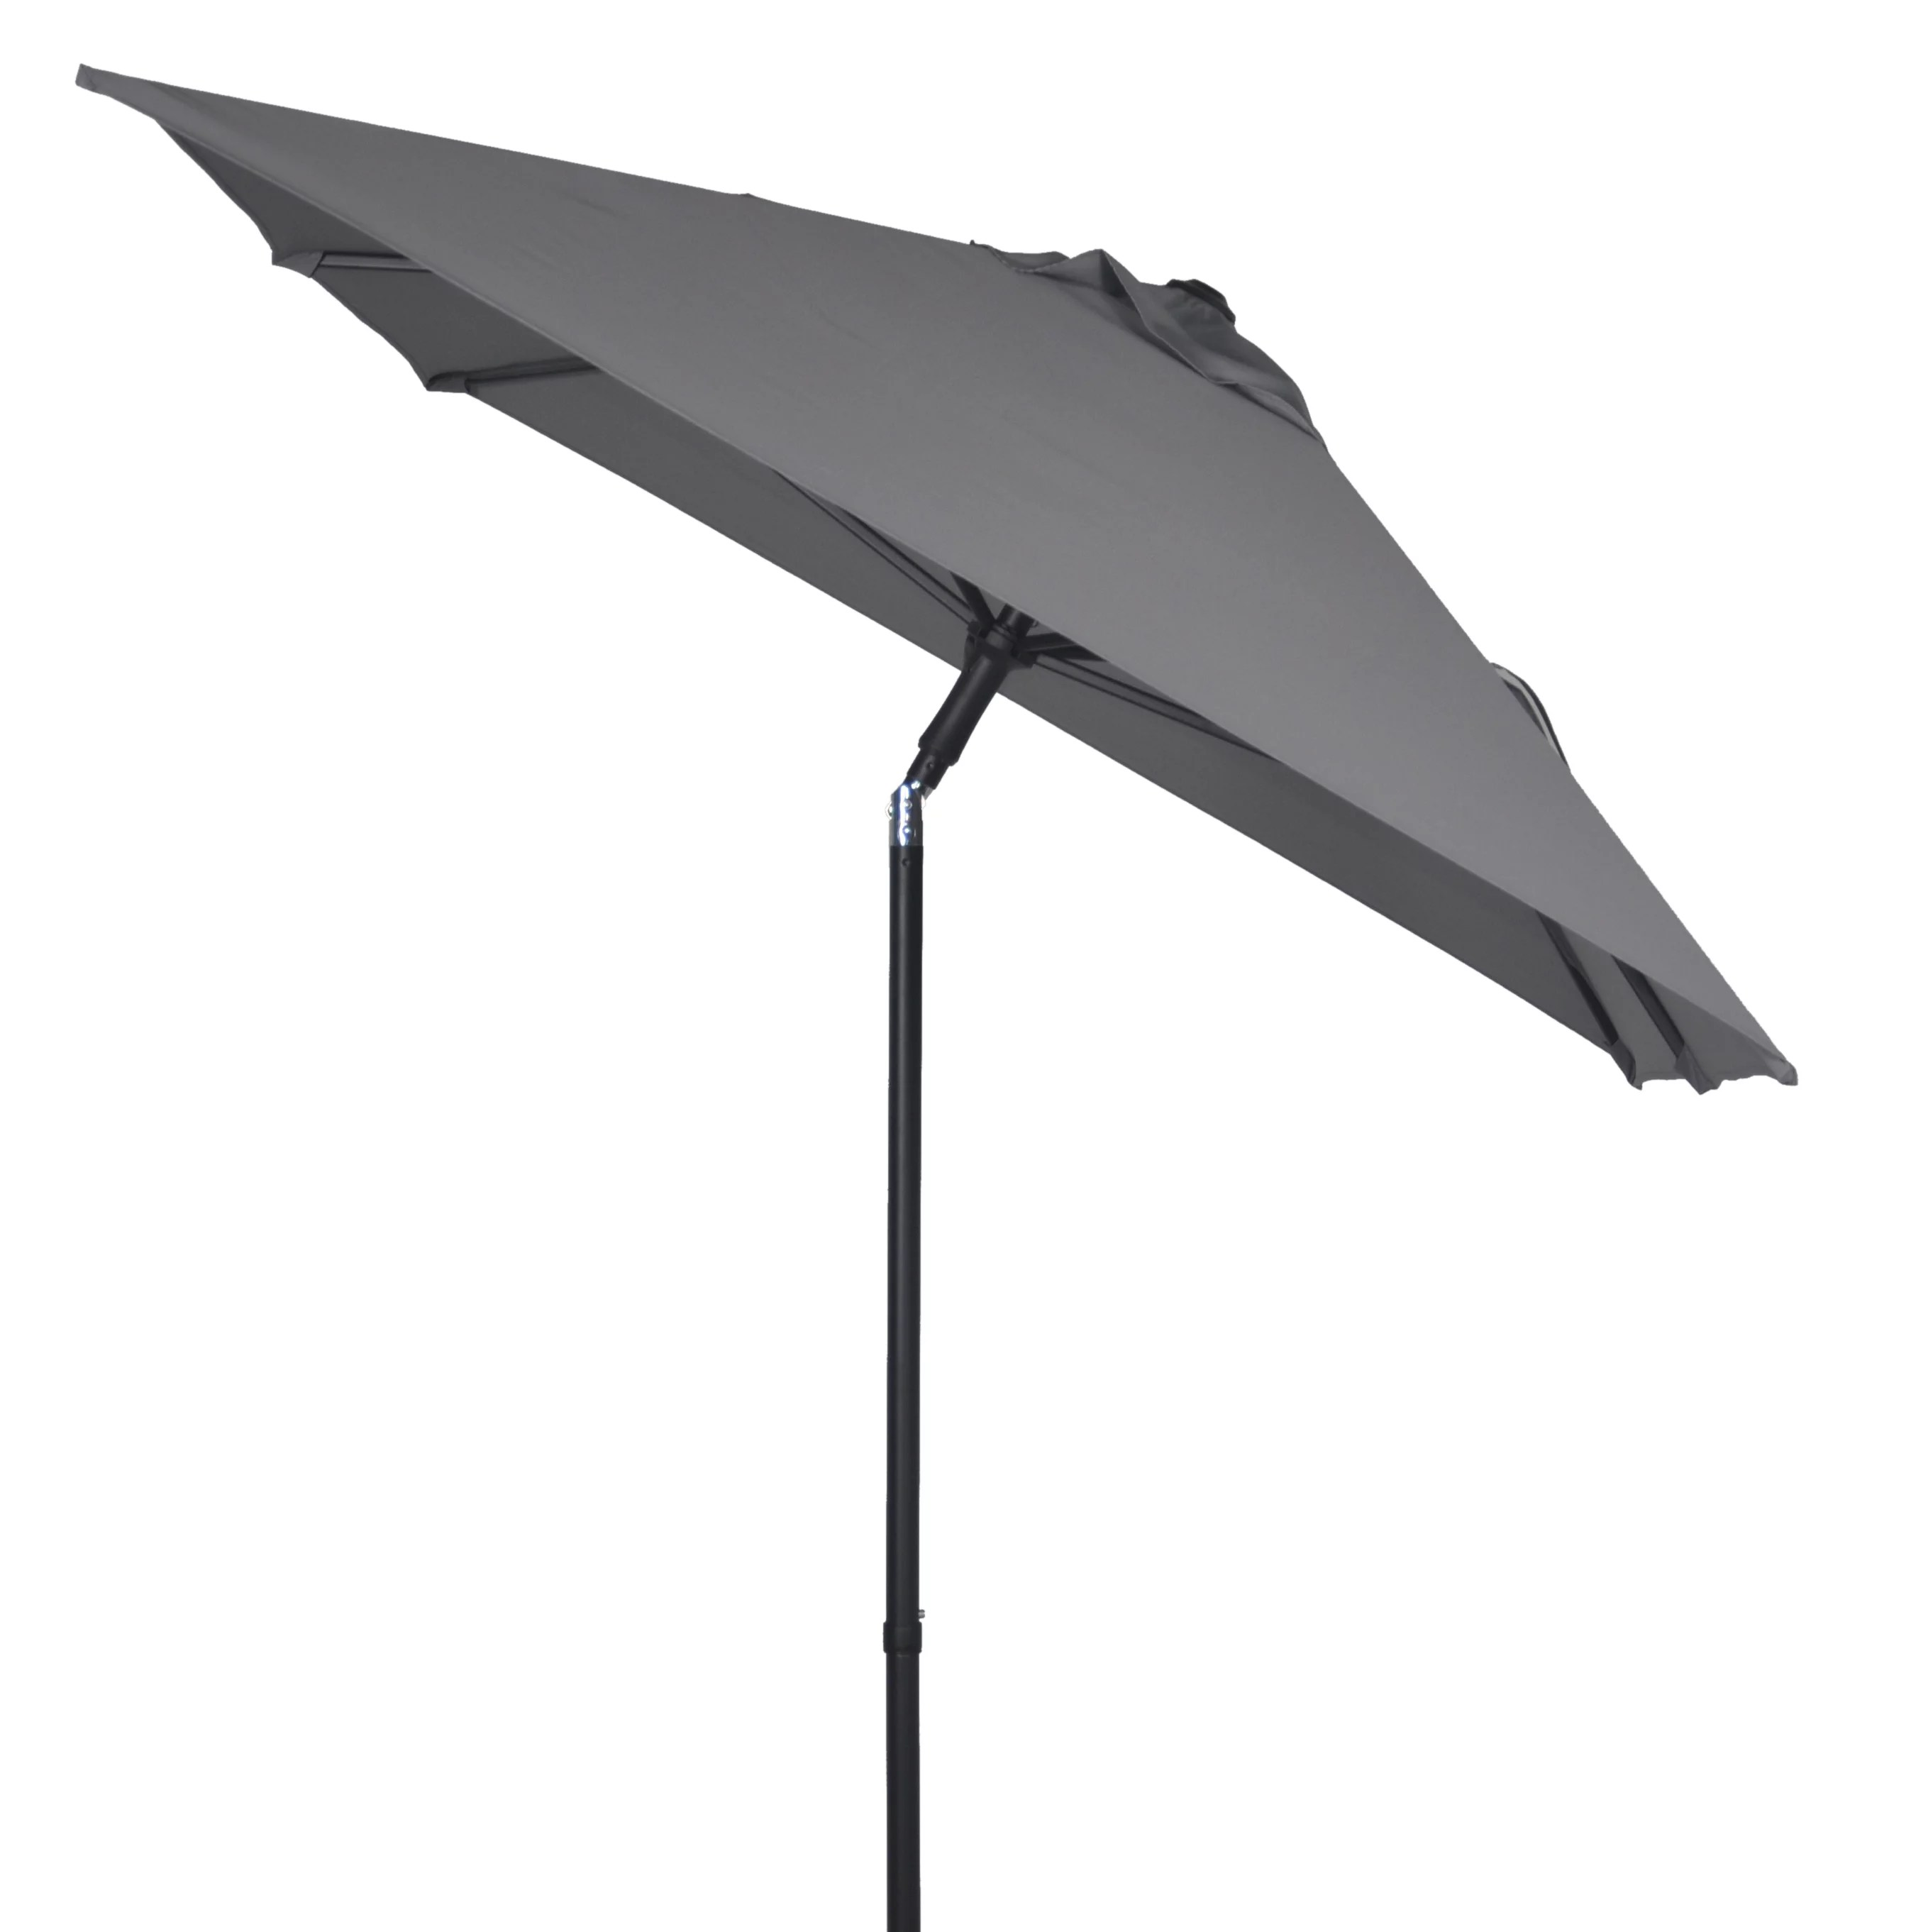 mainstays 5 5 x 6 5 rectangular outdoor market patio umbrella gray